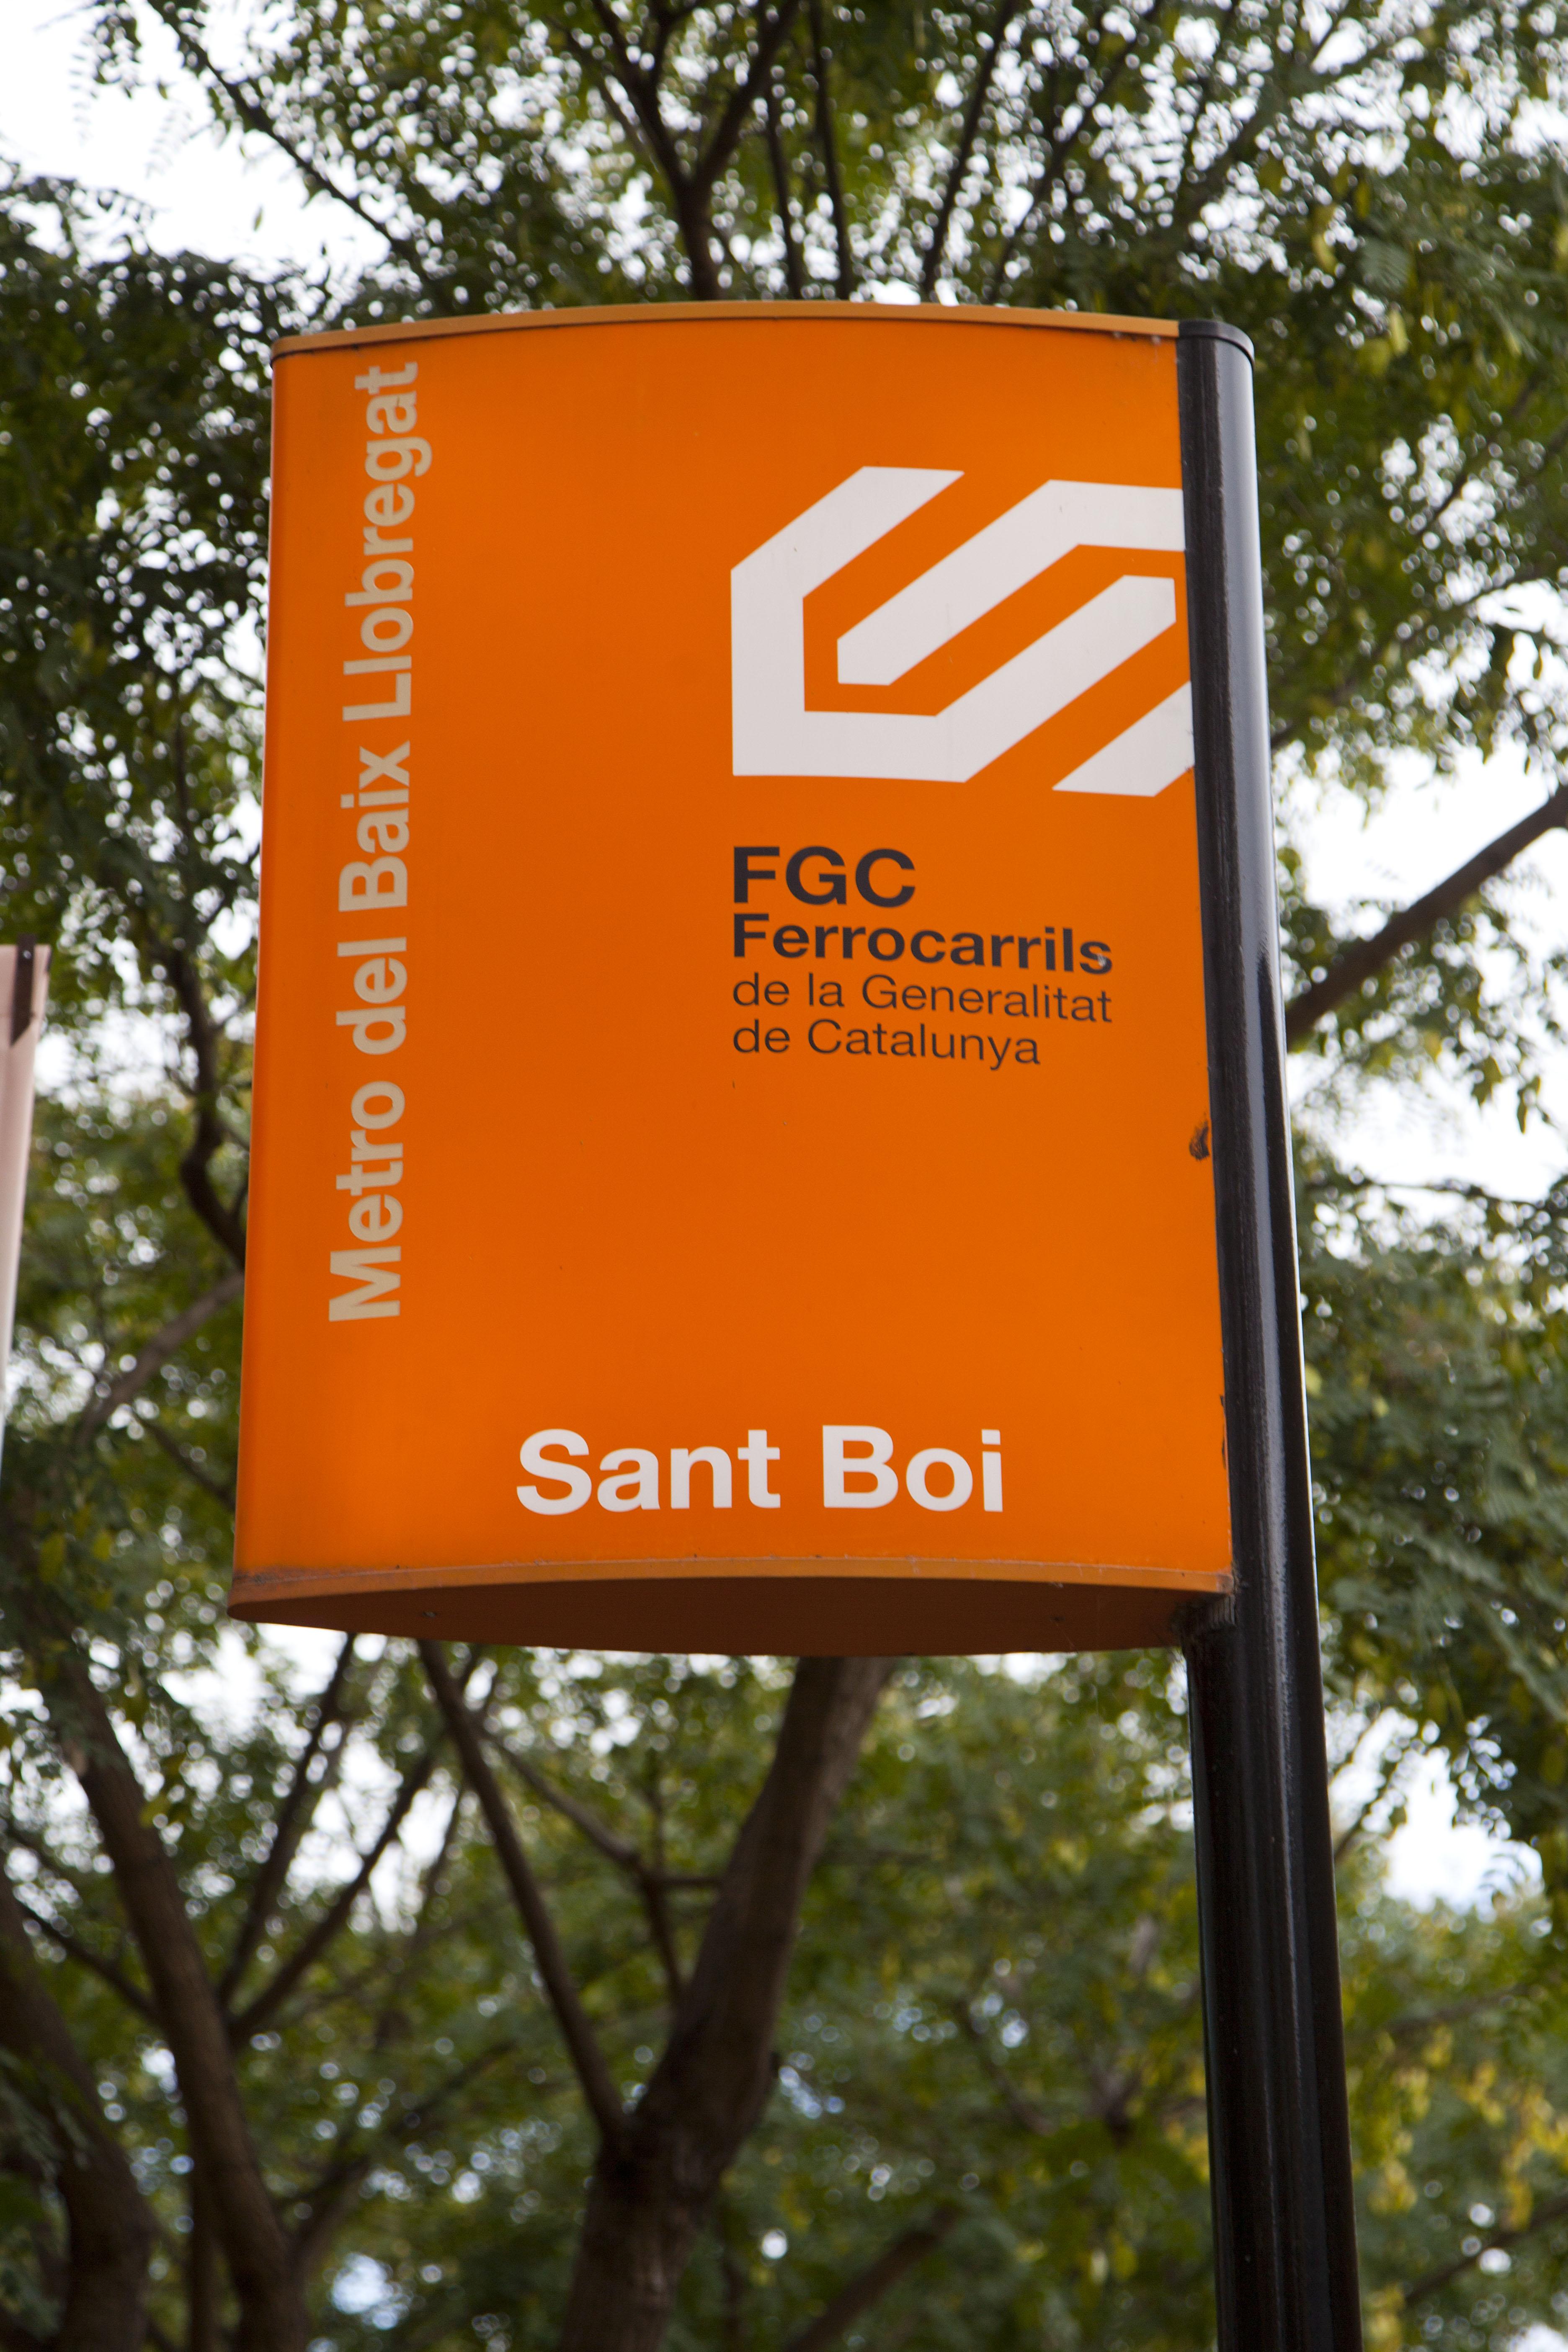 ST- BOI- FGC